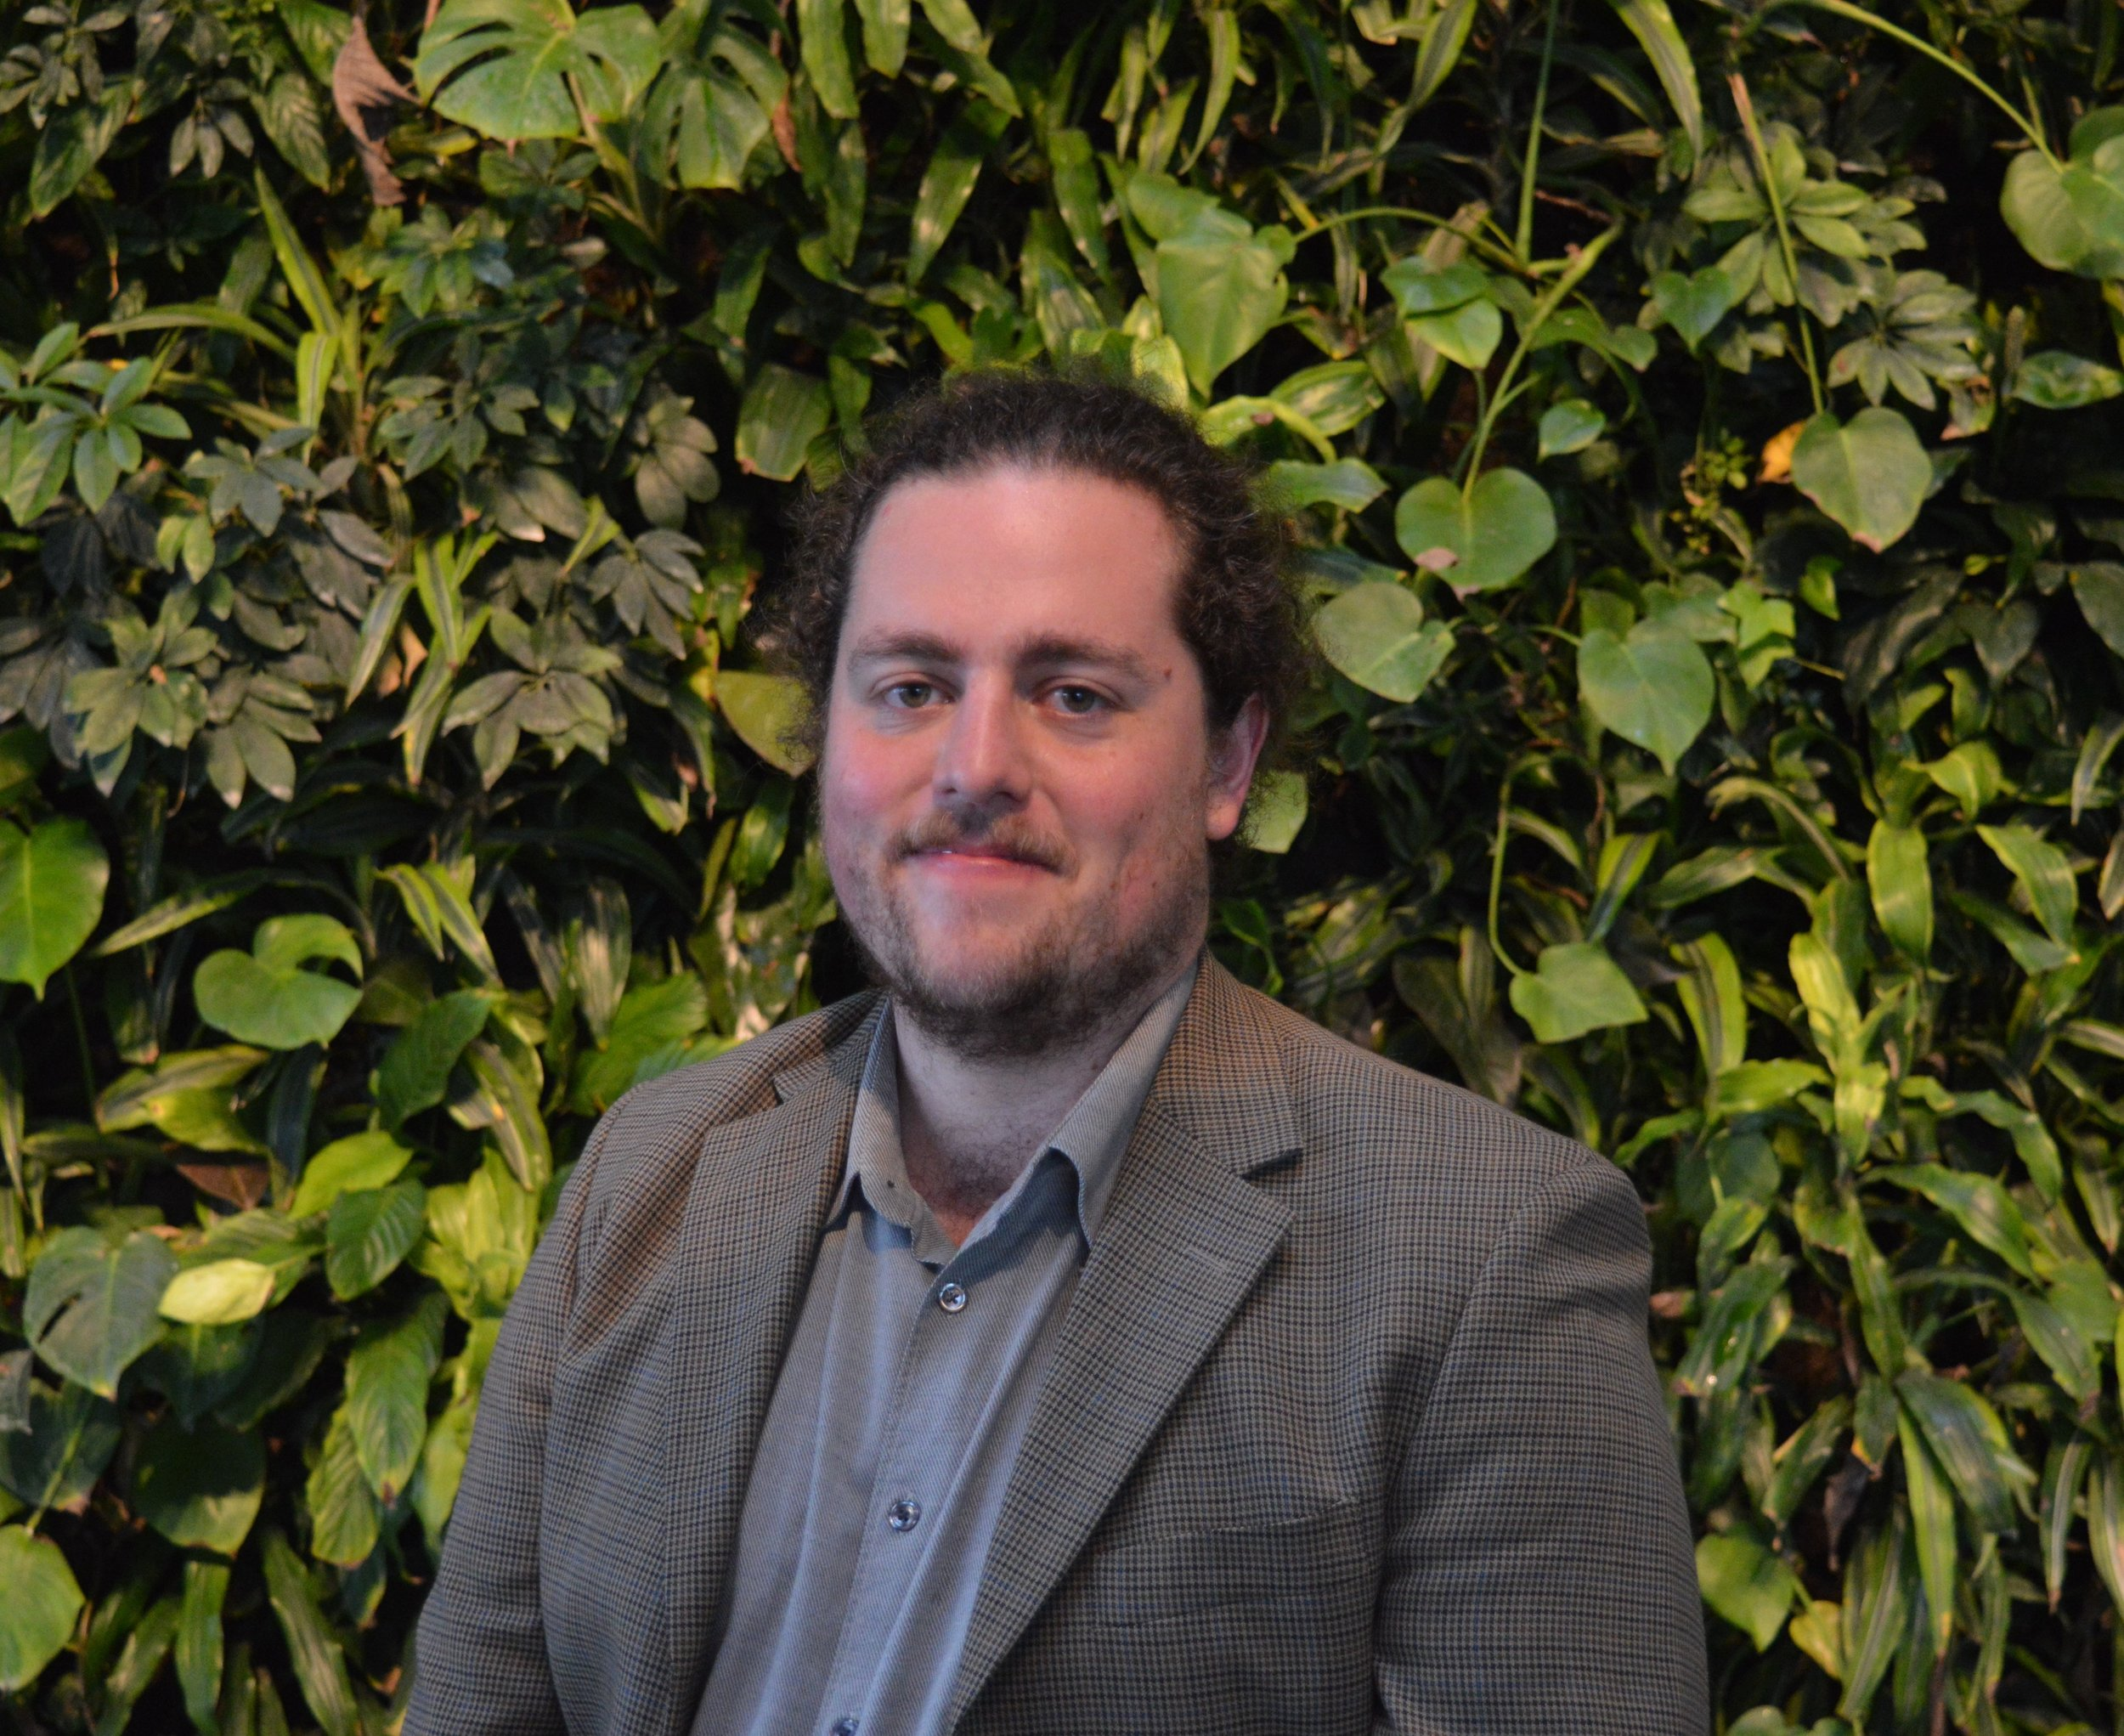 Profile Picture Etienne.JPG